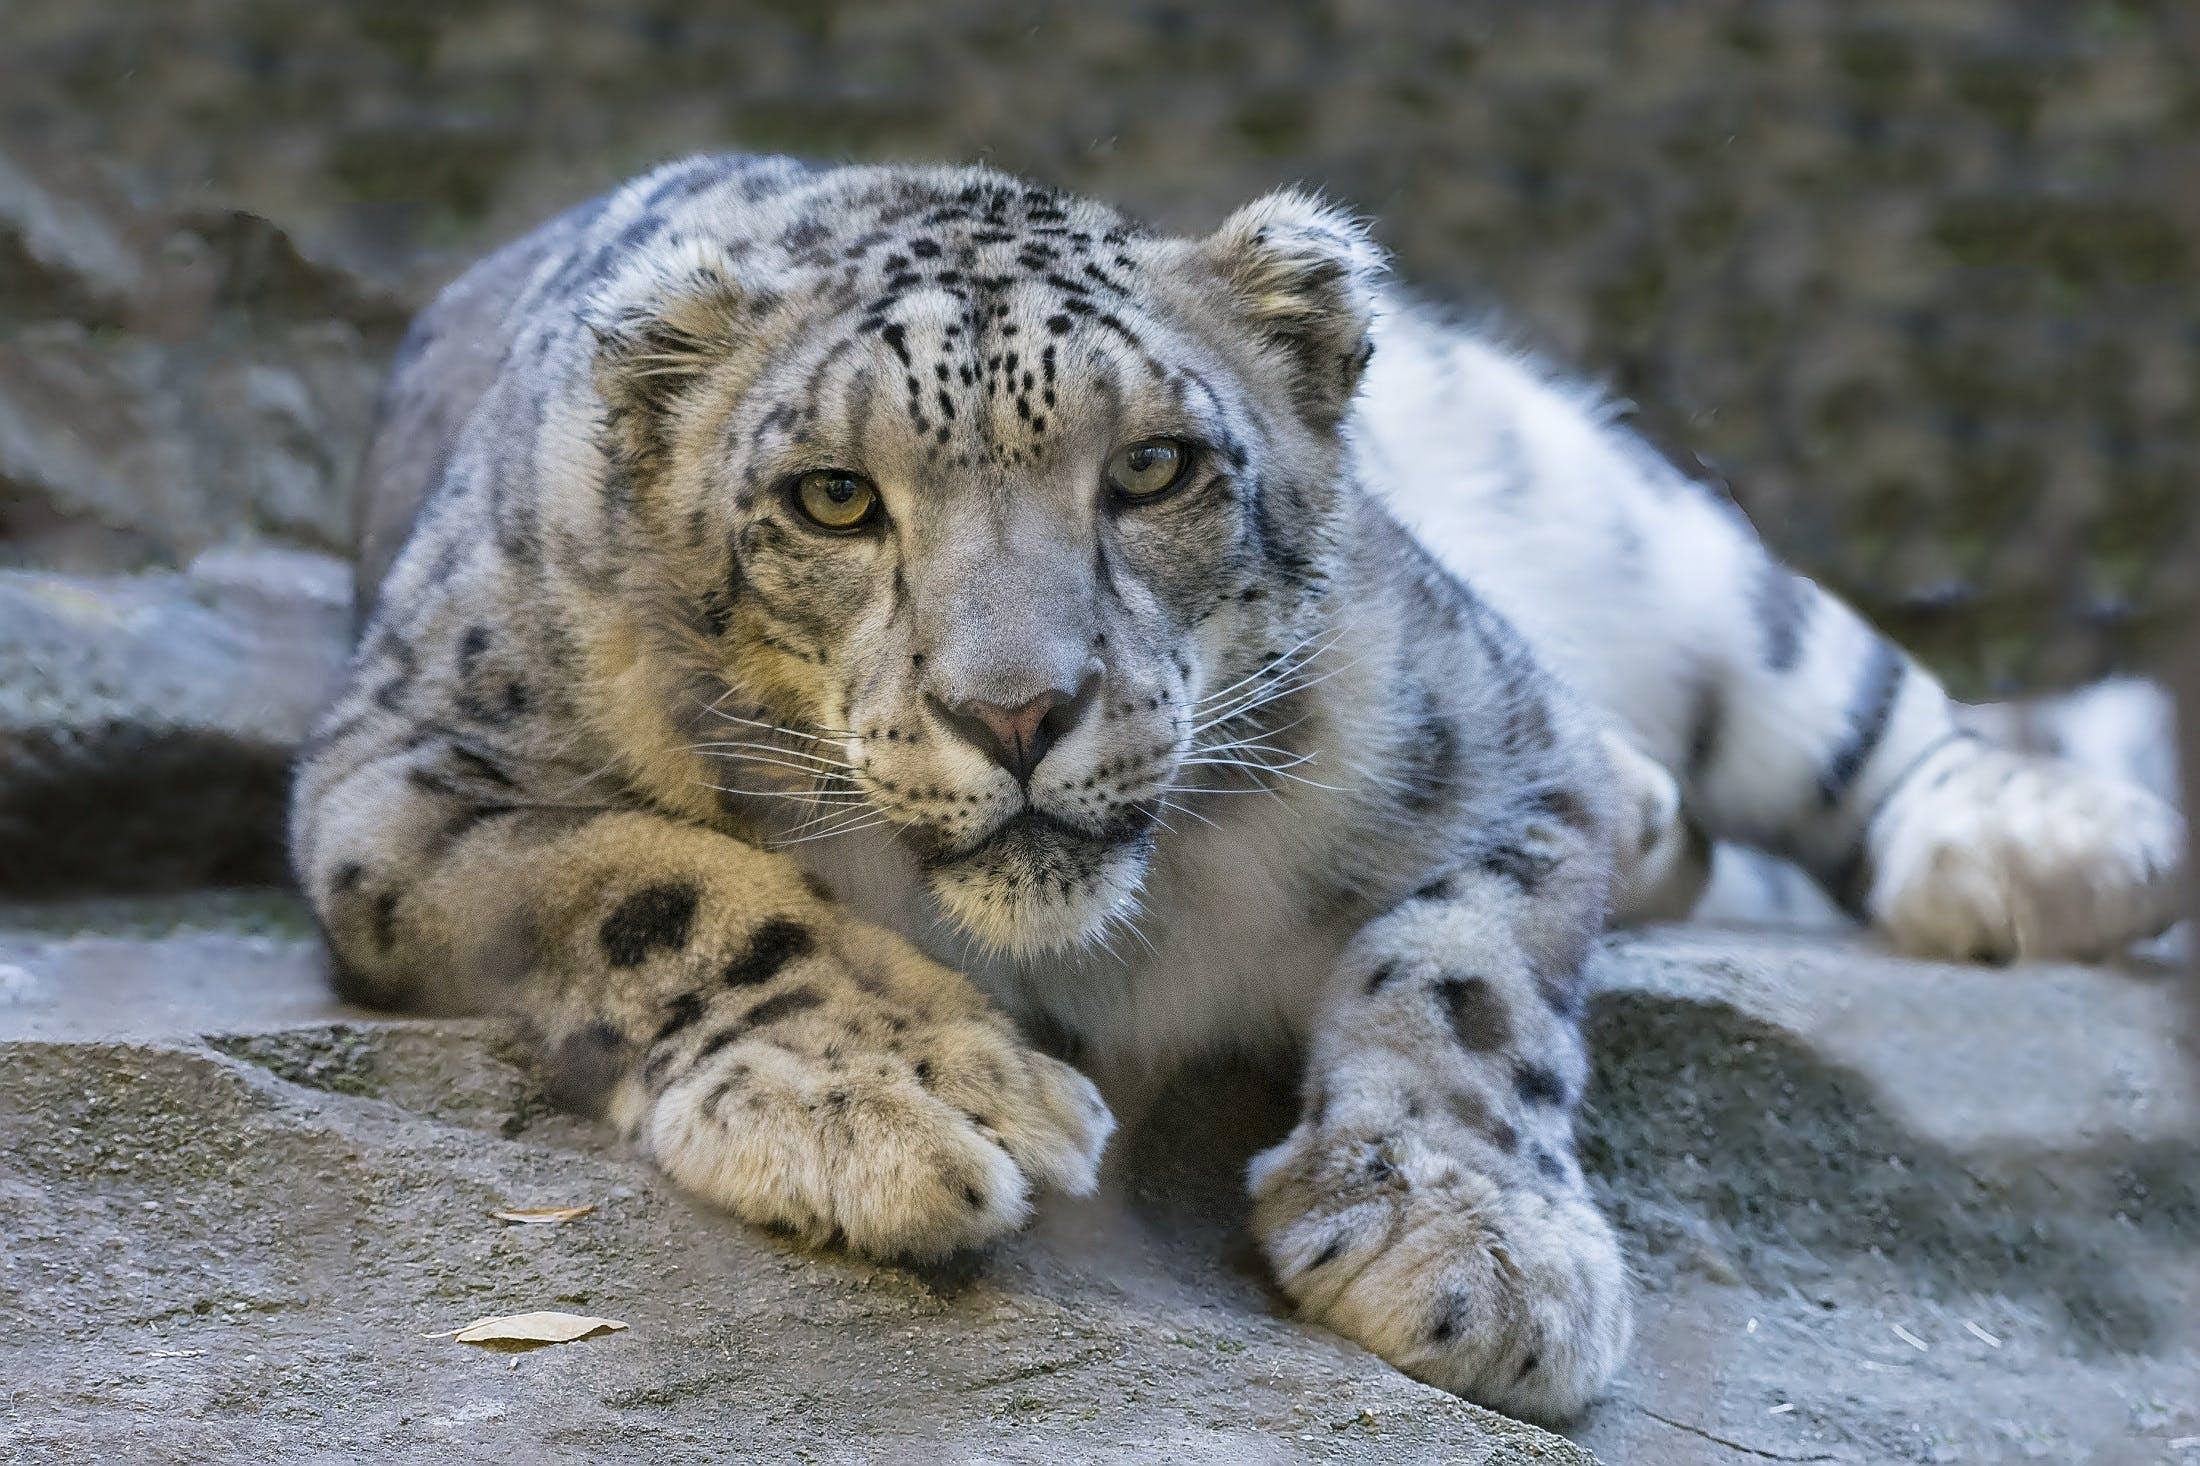 White Tiger on Grey Rock